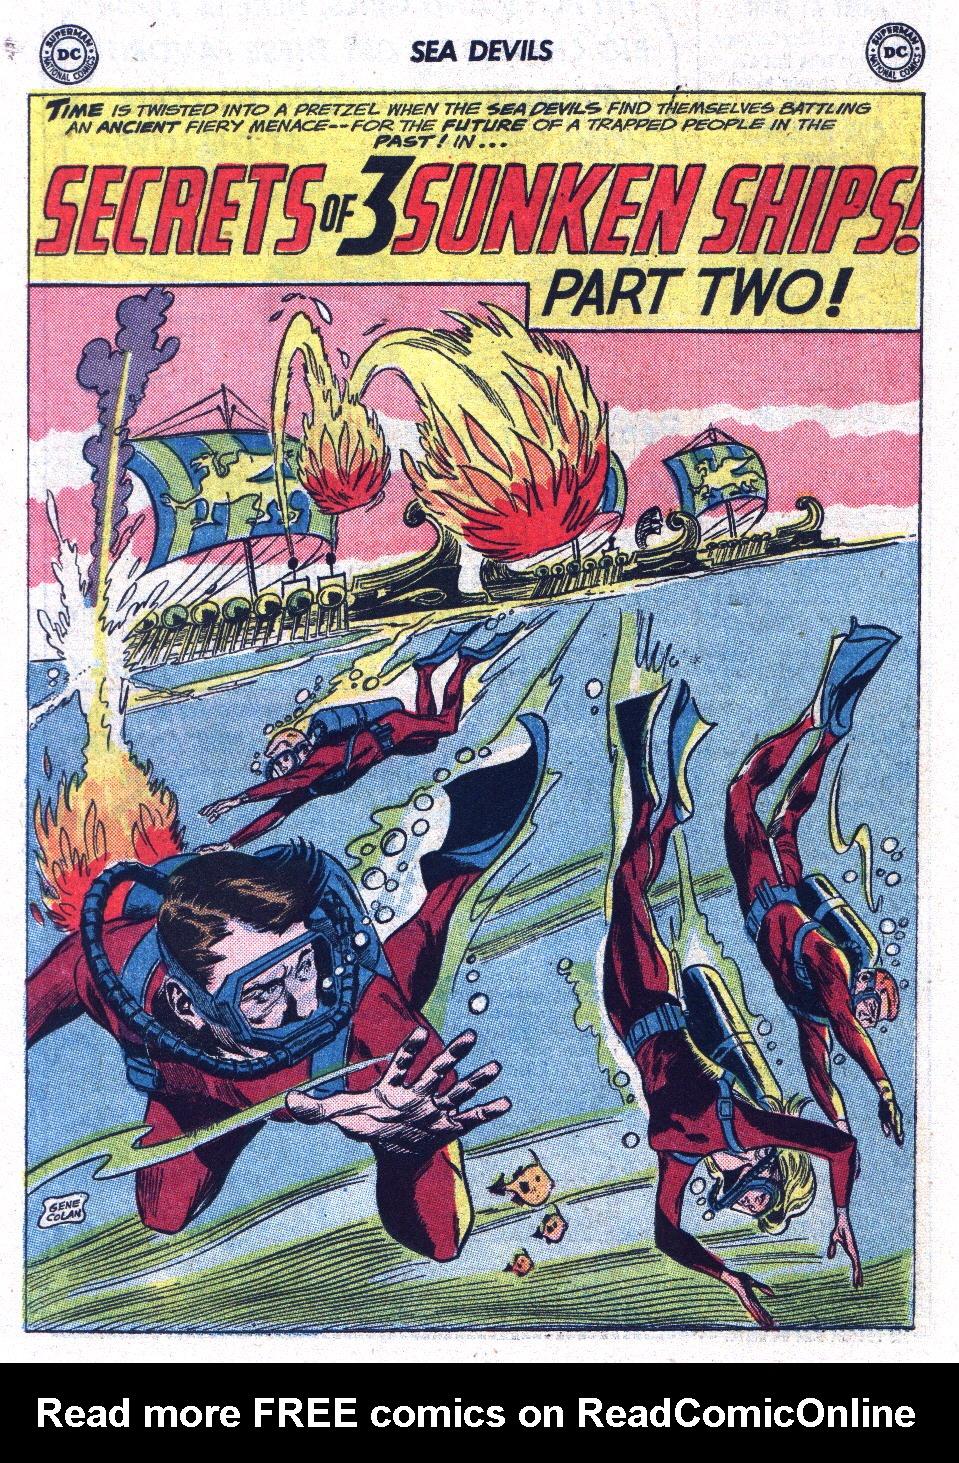 Read online Sea Devils comic -  Issue #13 - 14